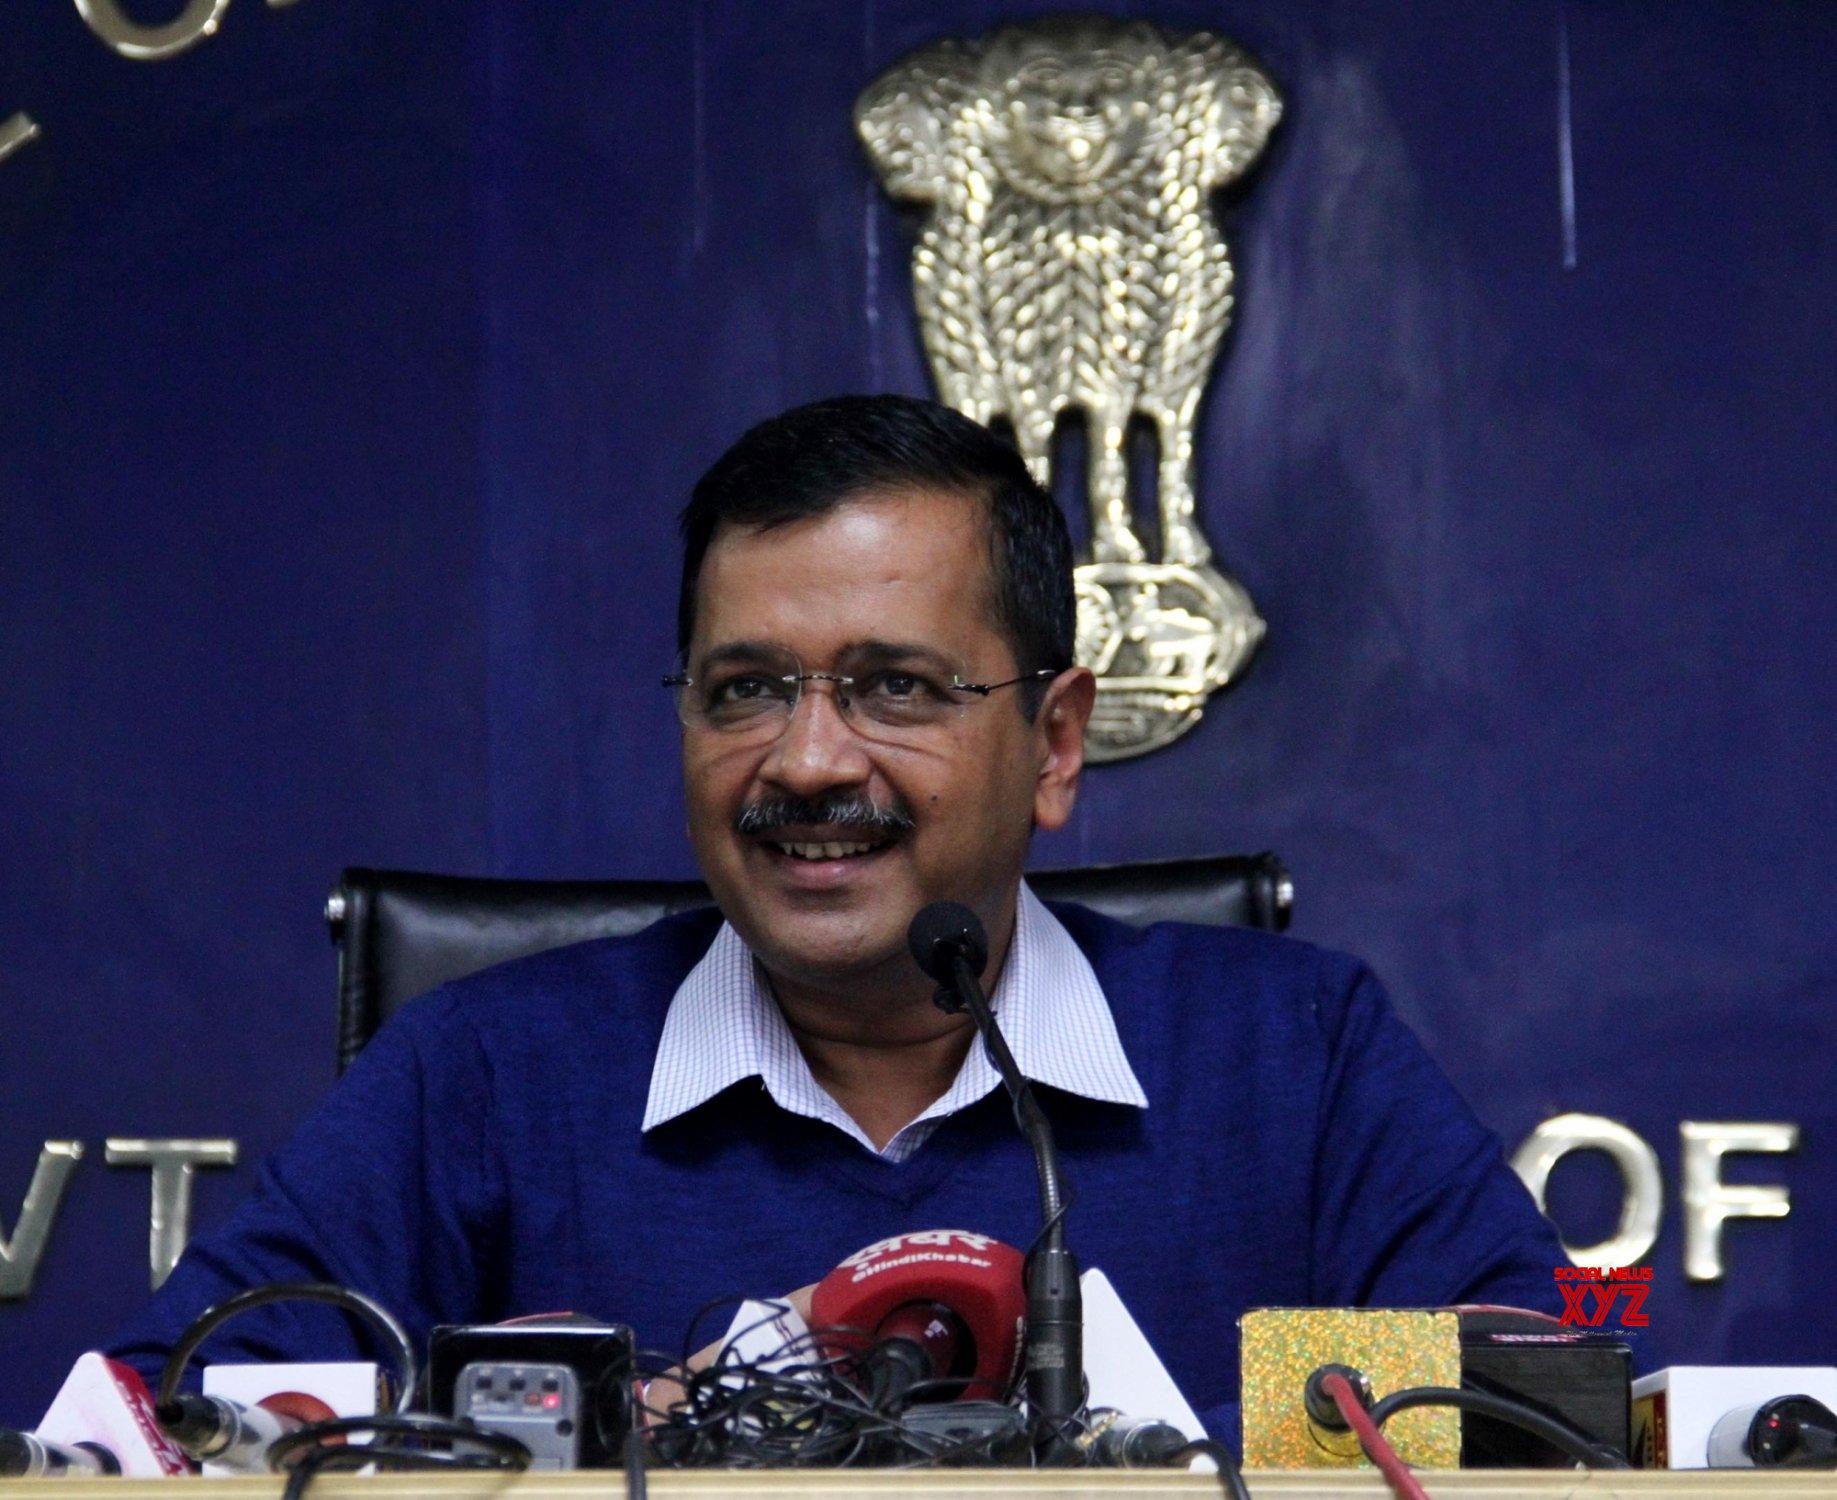 Our goal is to make Delhi India's EV capital: Kejriwal